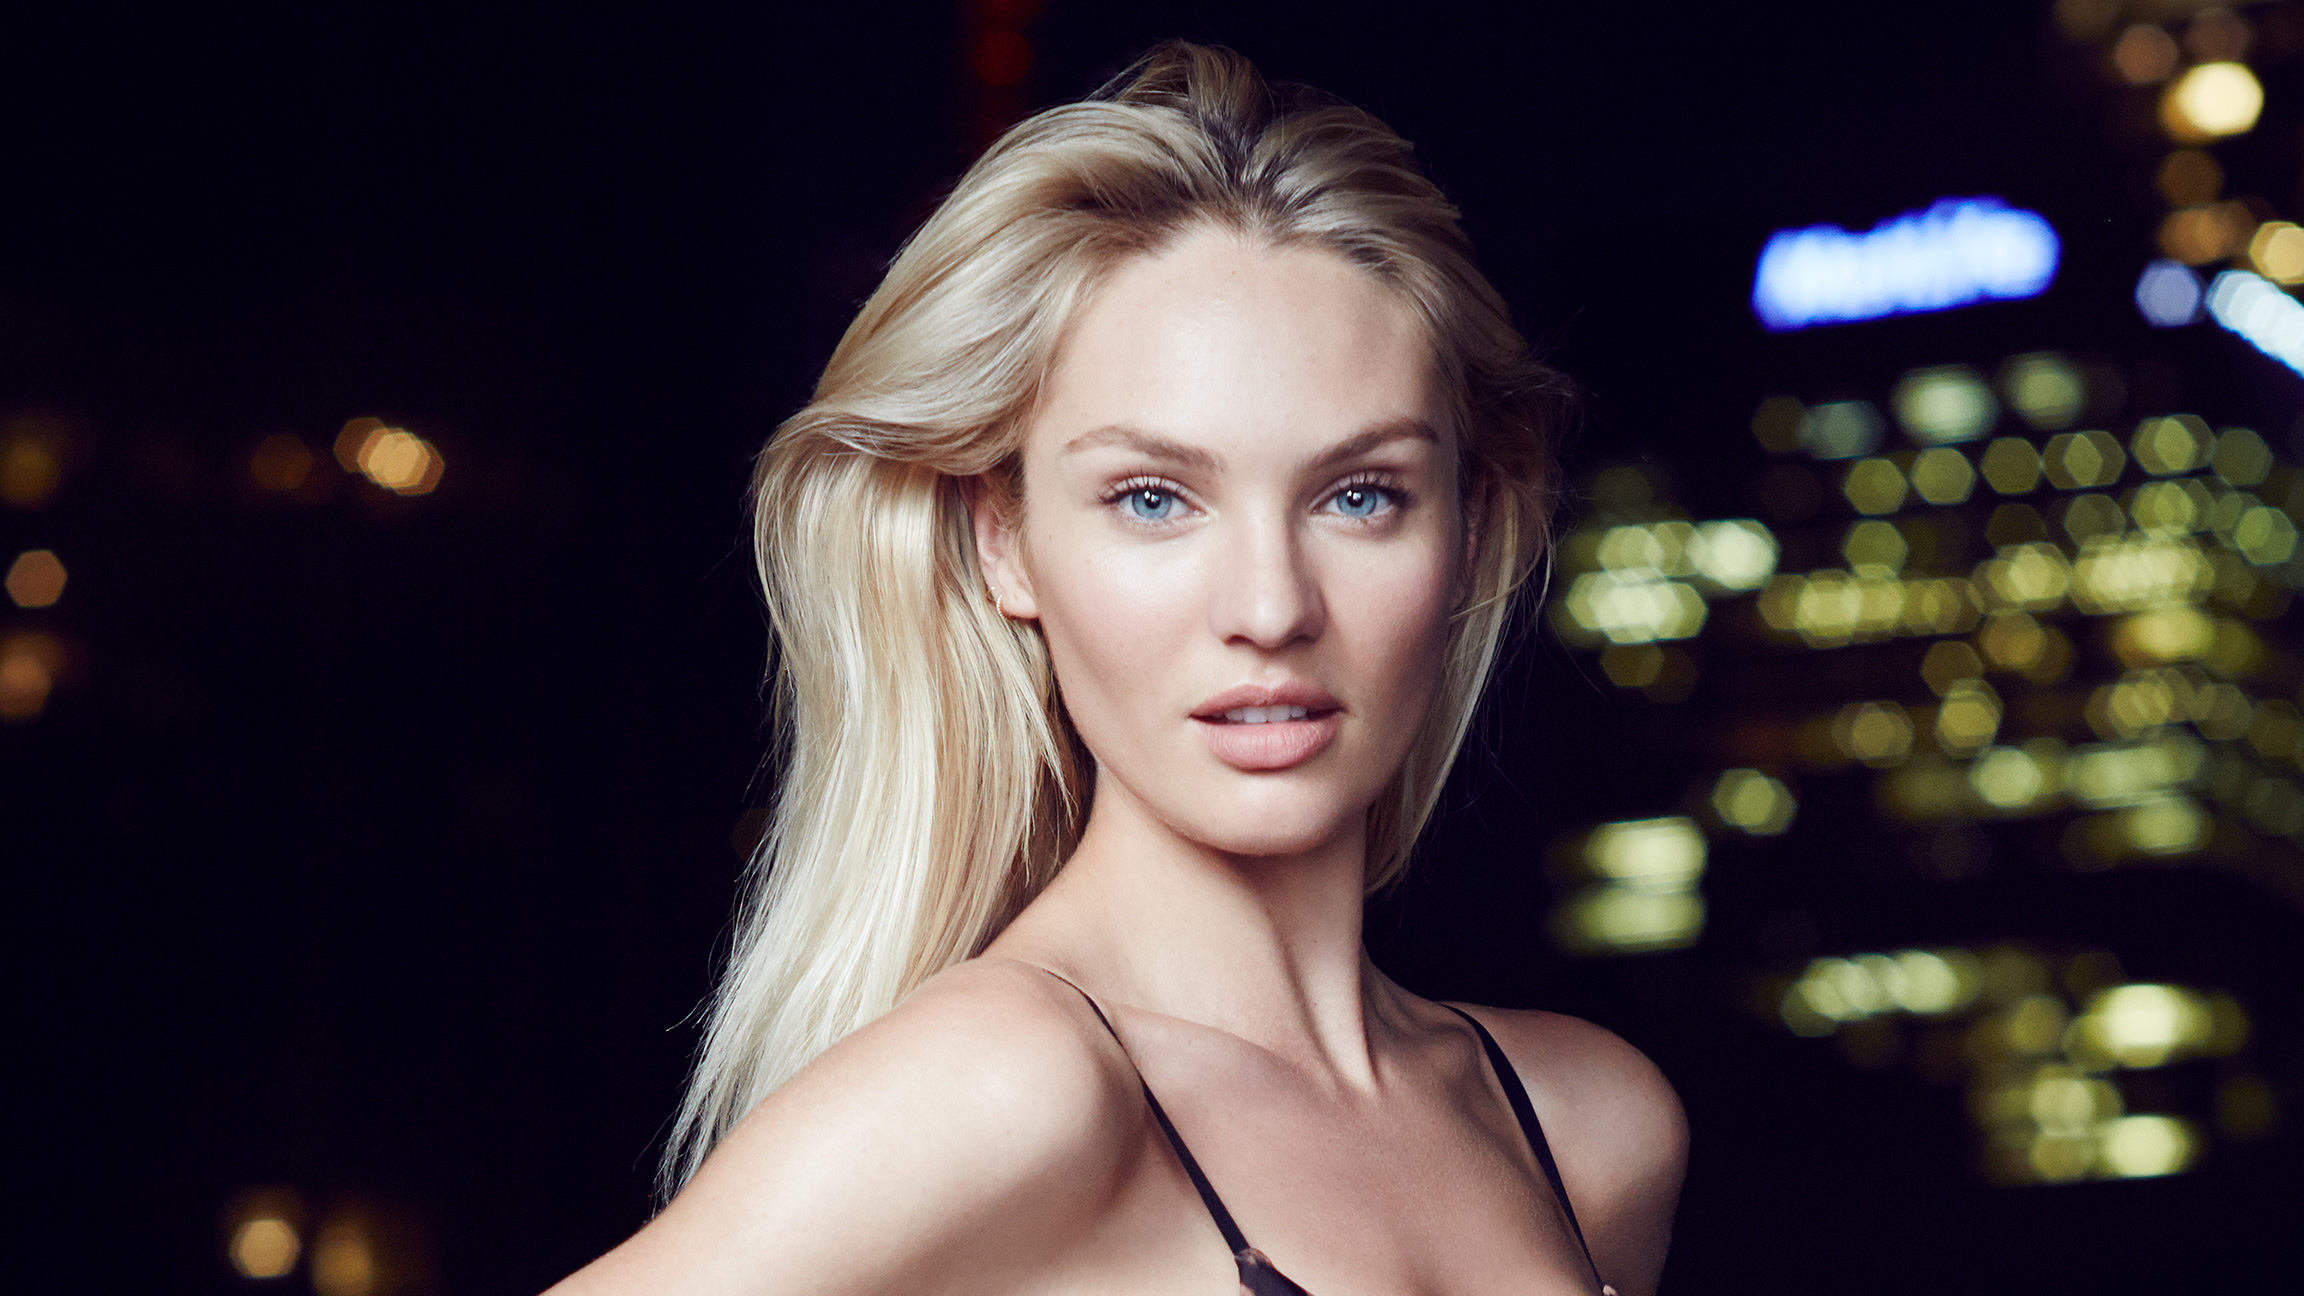 1400x900 Candice Swanepoel 1400x900 Resolution Hd 4k